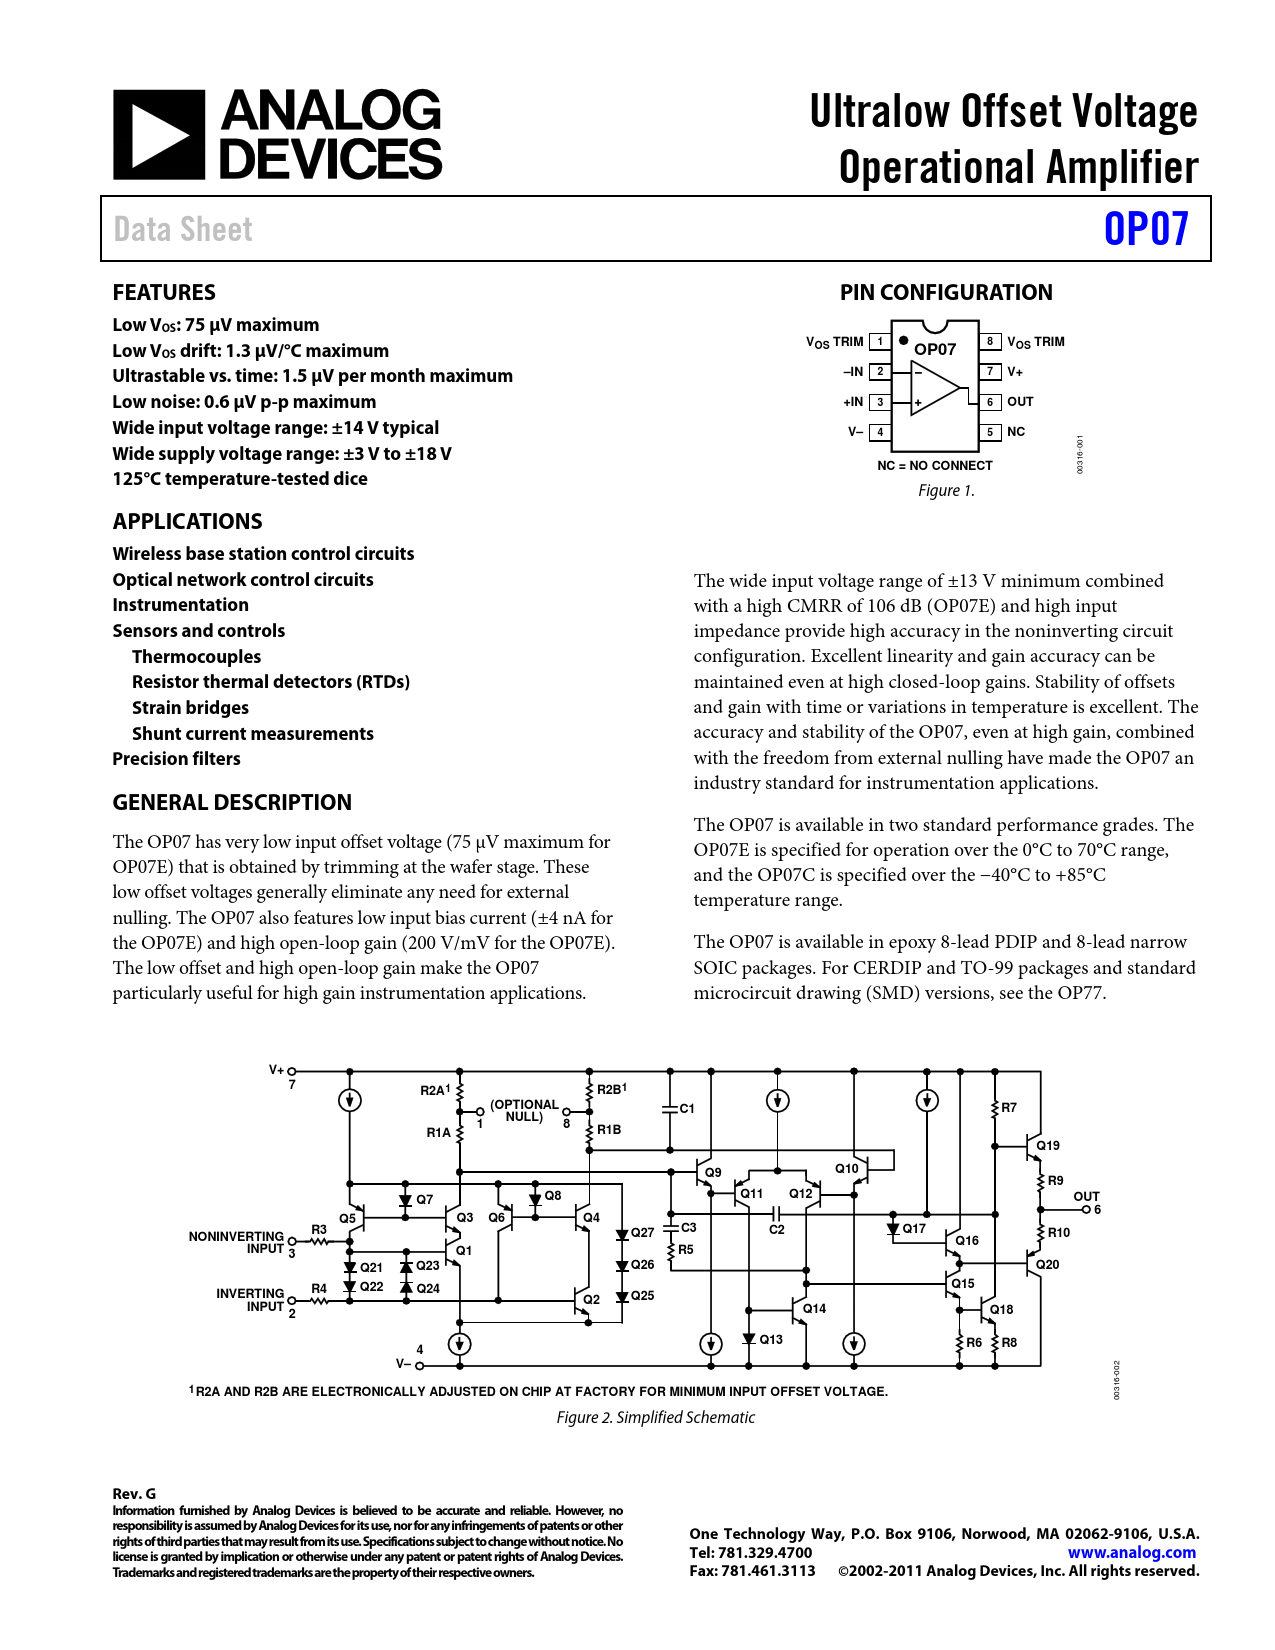 Datasheet OP07 Analog Devices, Версия: G